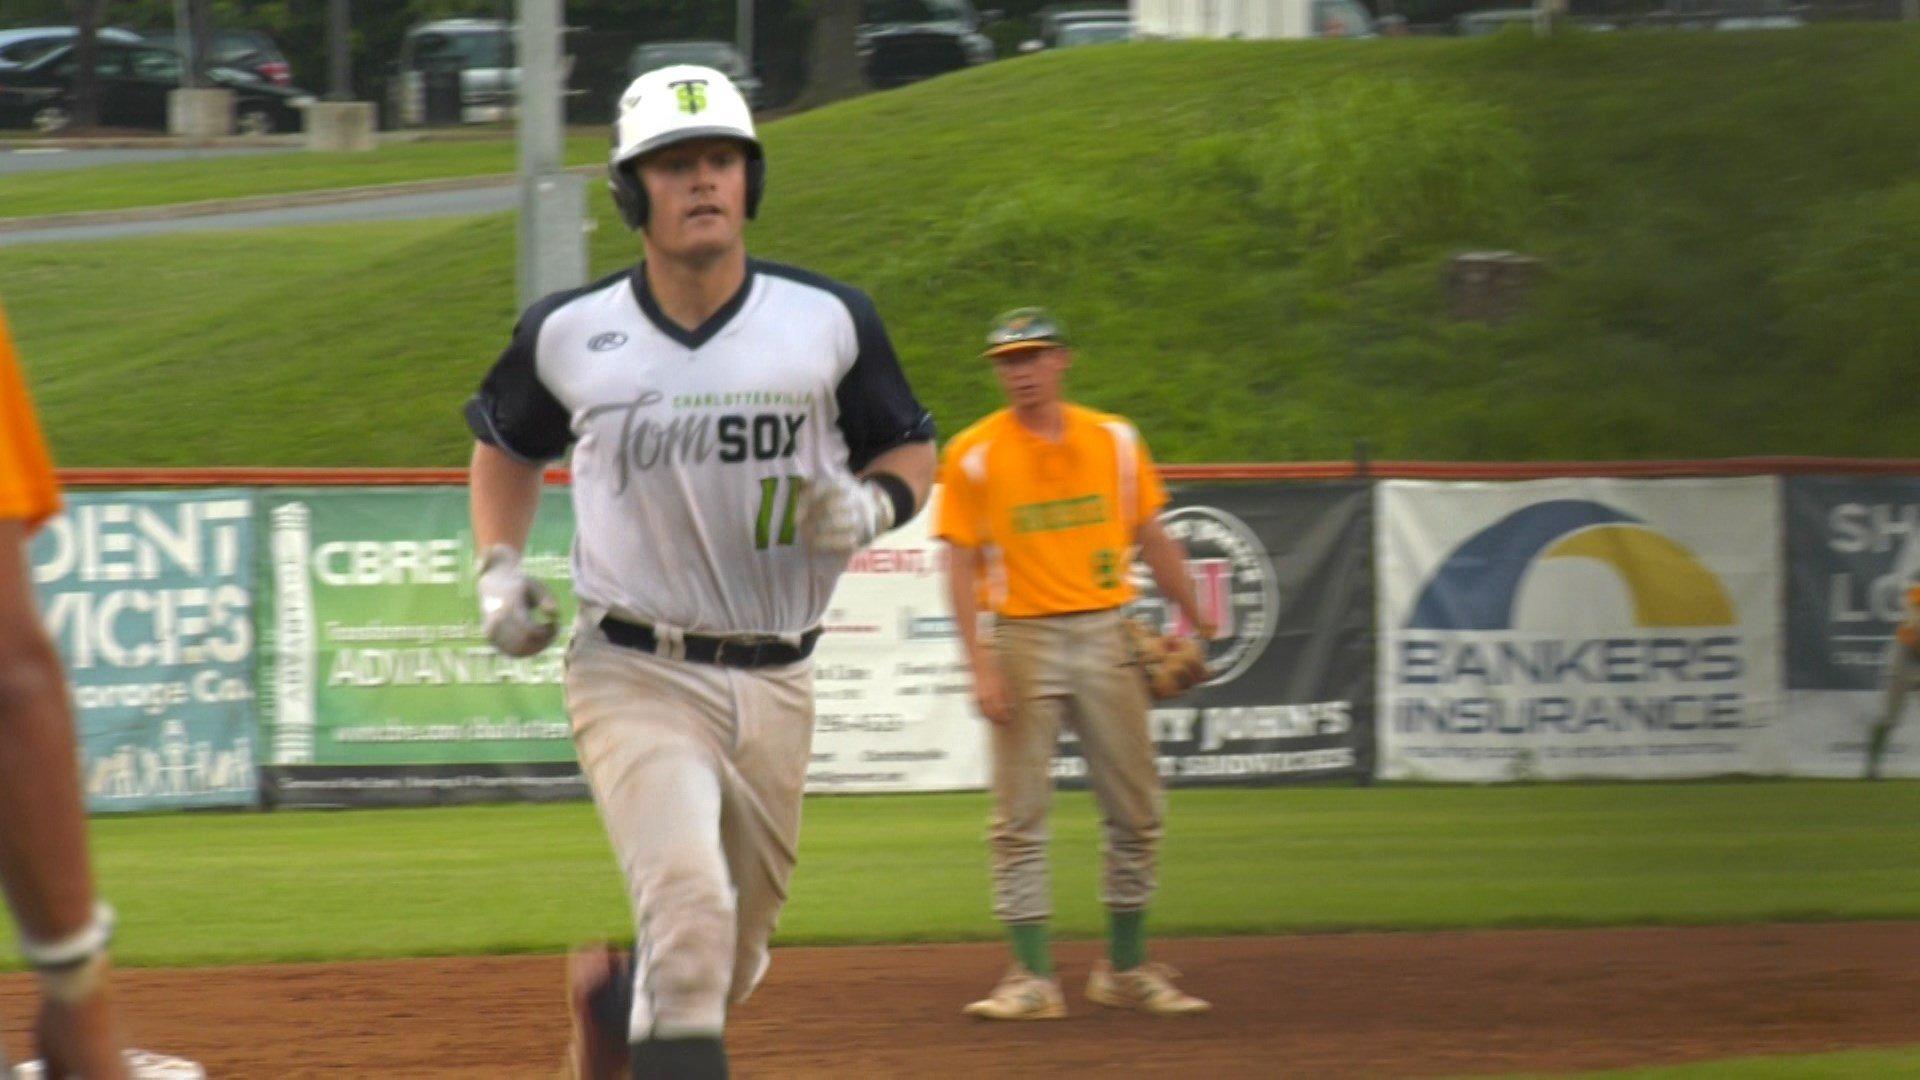 Nick Oar hits a 2-run home run